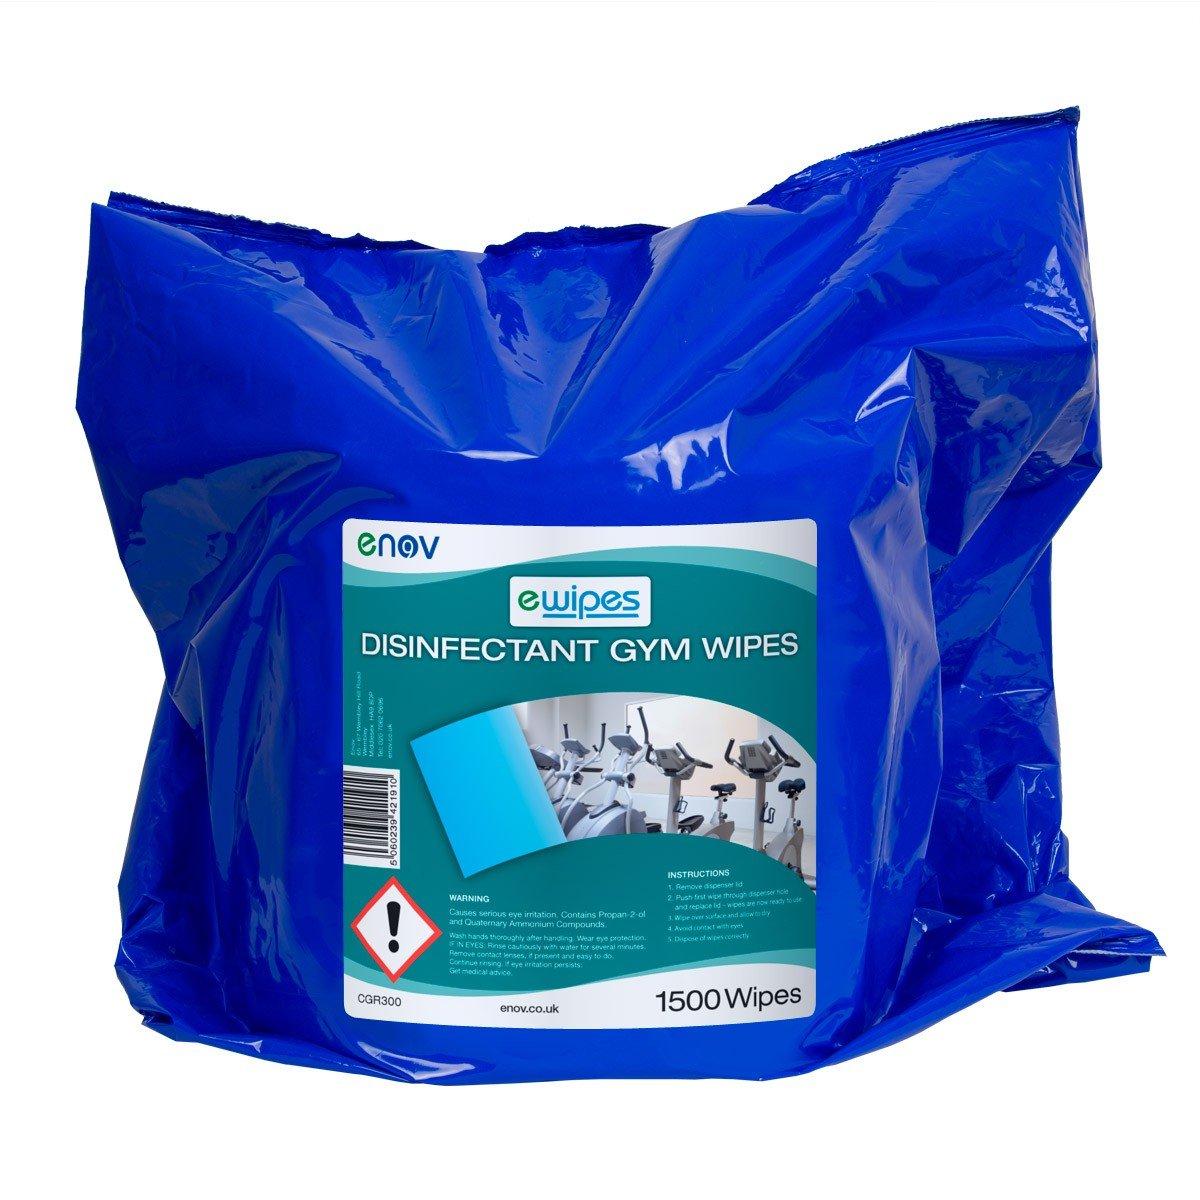 ewipes cgr300 enov gimnasio equipo desinfectante limpiador (Pack ...